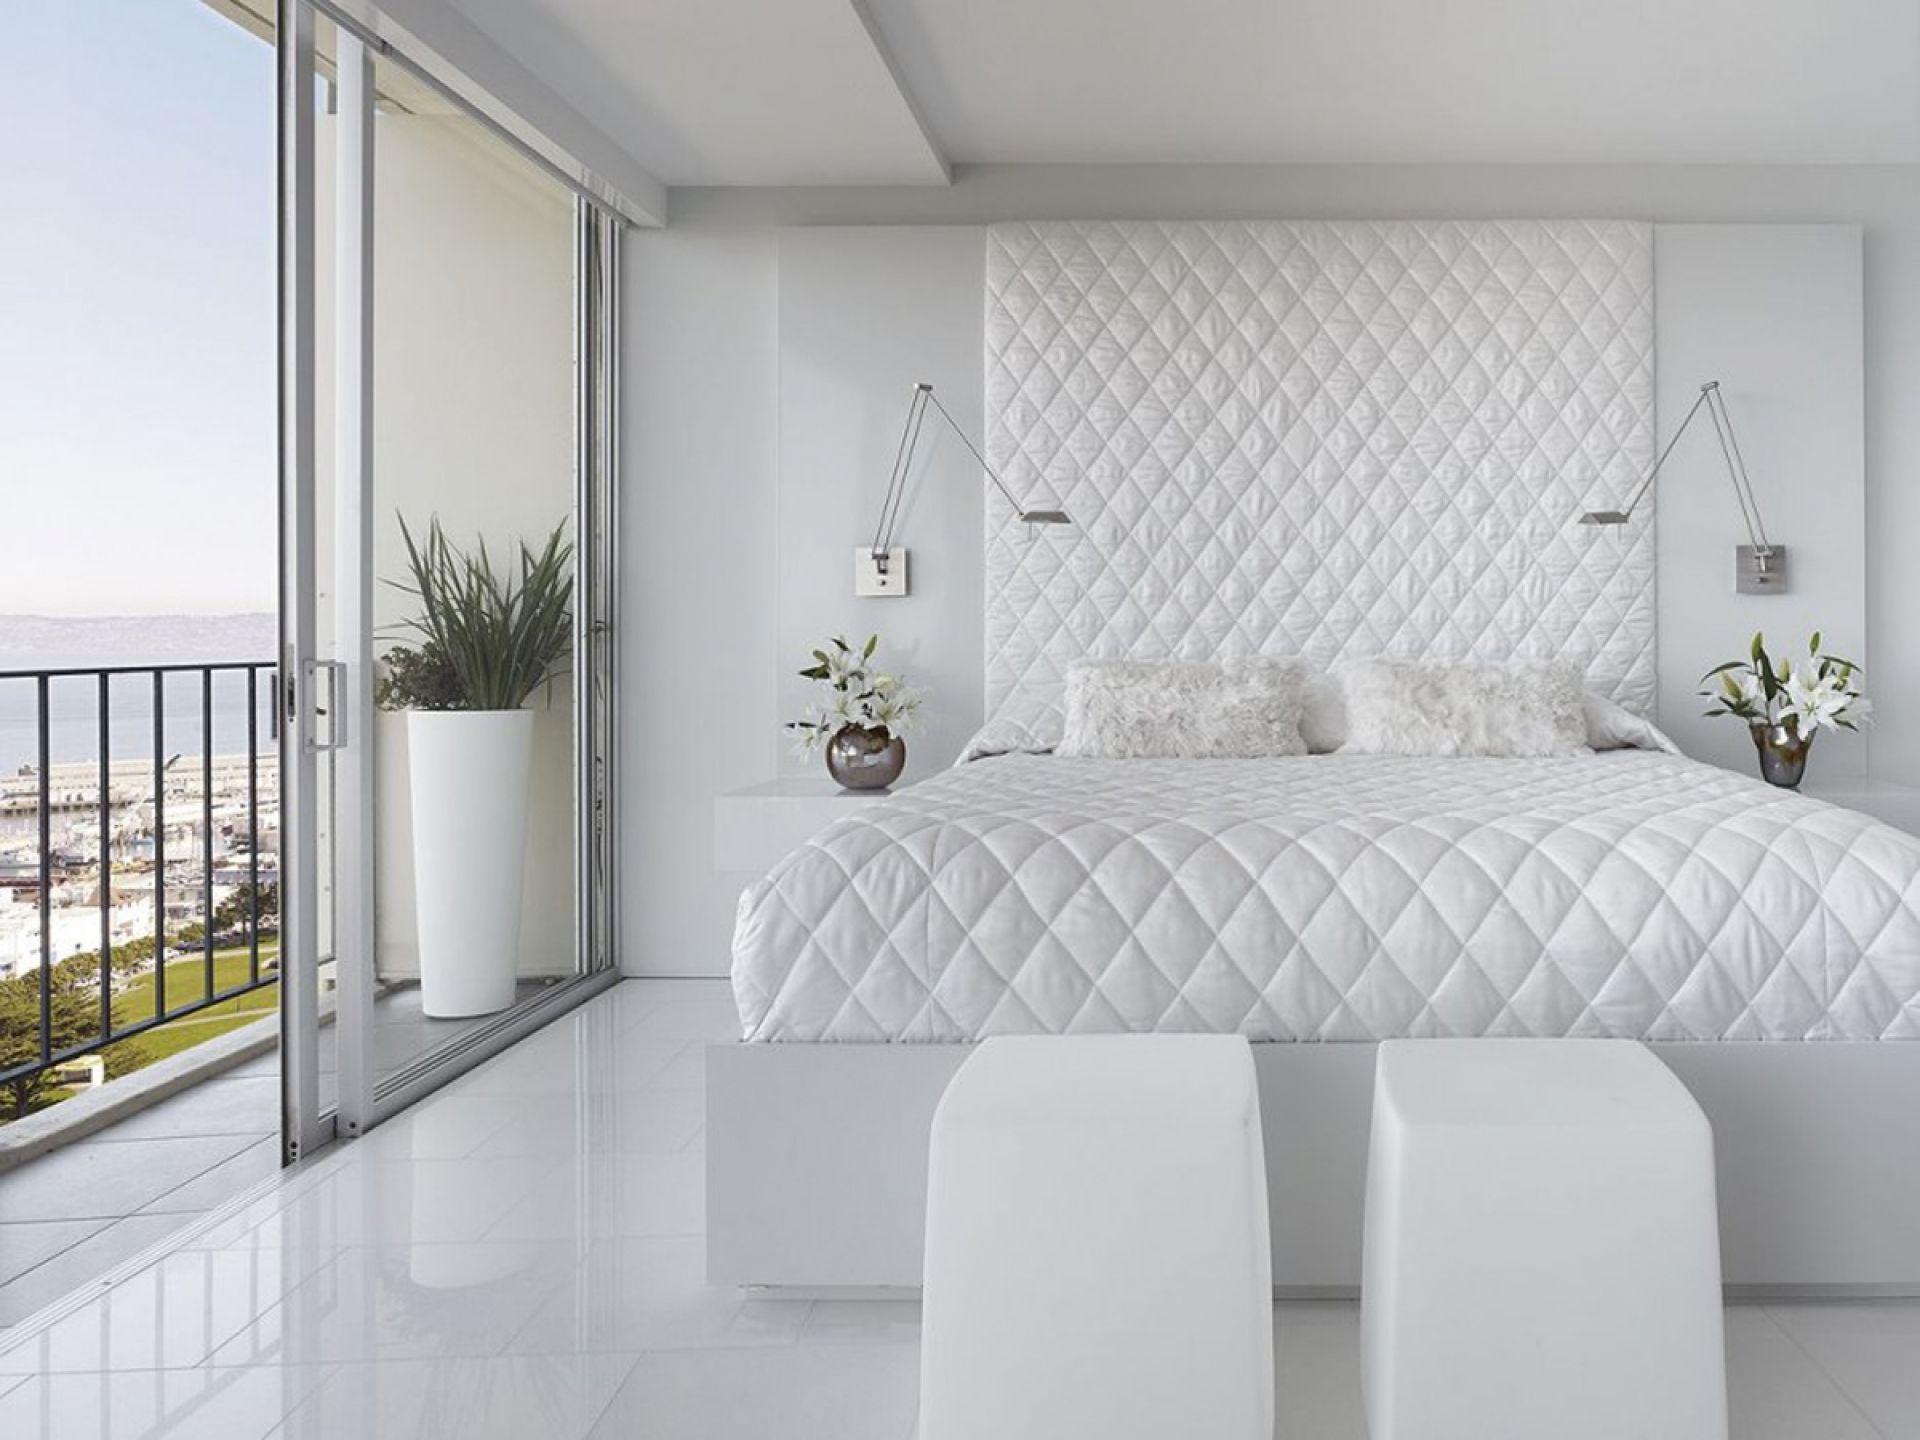 English style bedrooms - 1920x1440 Amazing Transformative English Style Bedroom 1200x920 Pixel